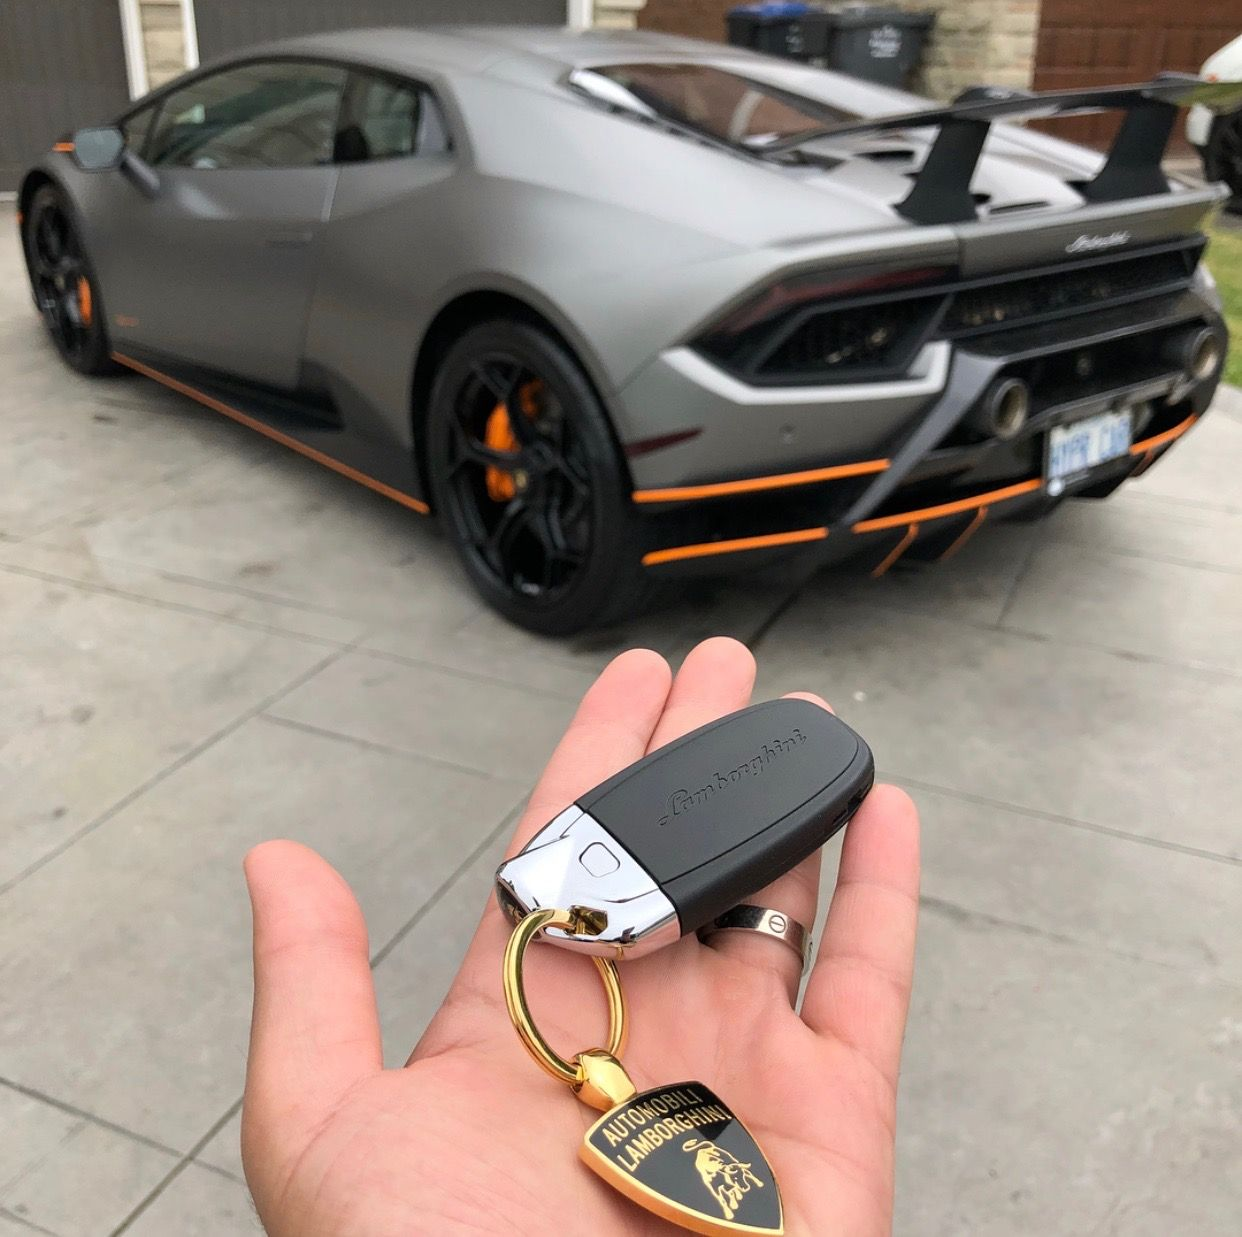 The Key Of The Lamborghini Huracan Performante Painted In Grigio